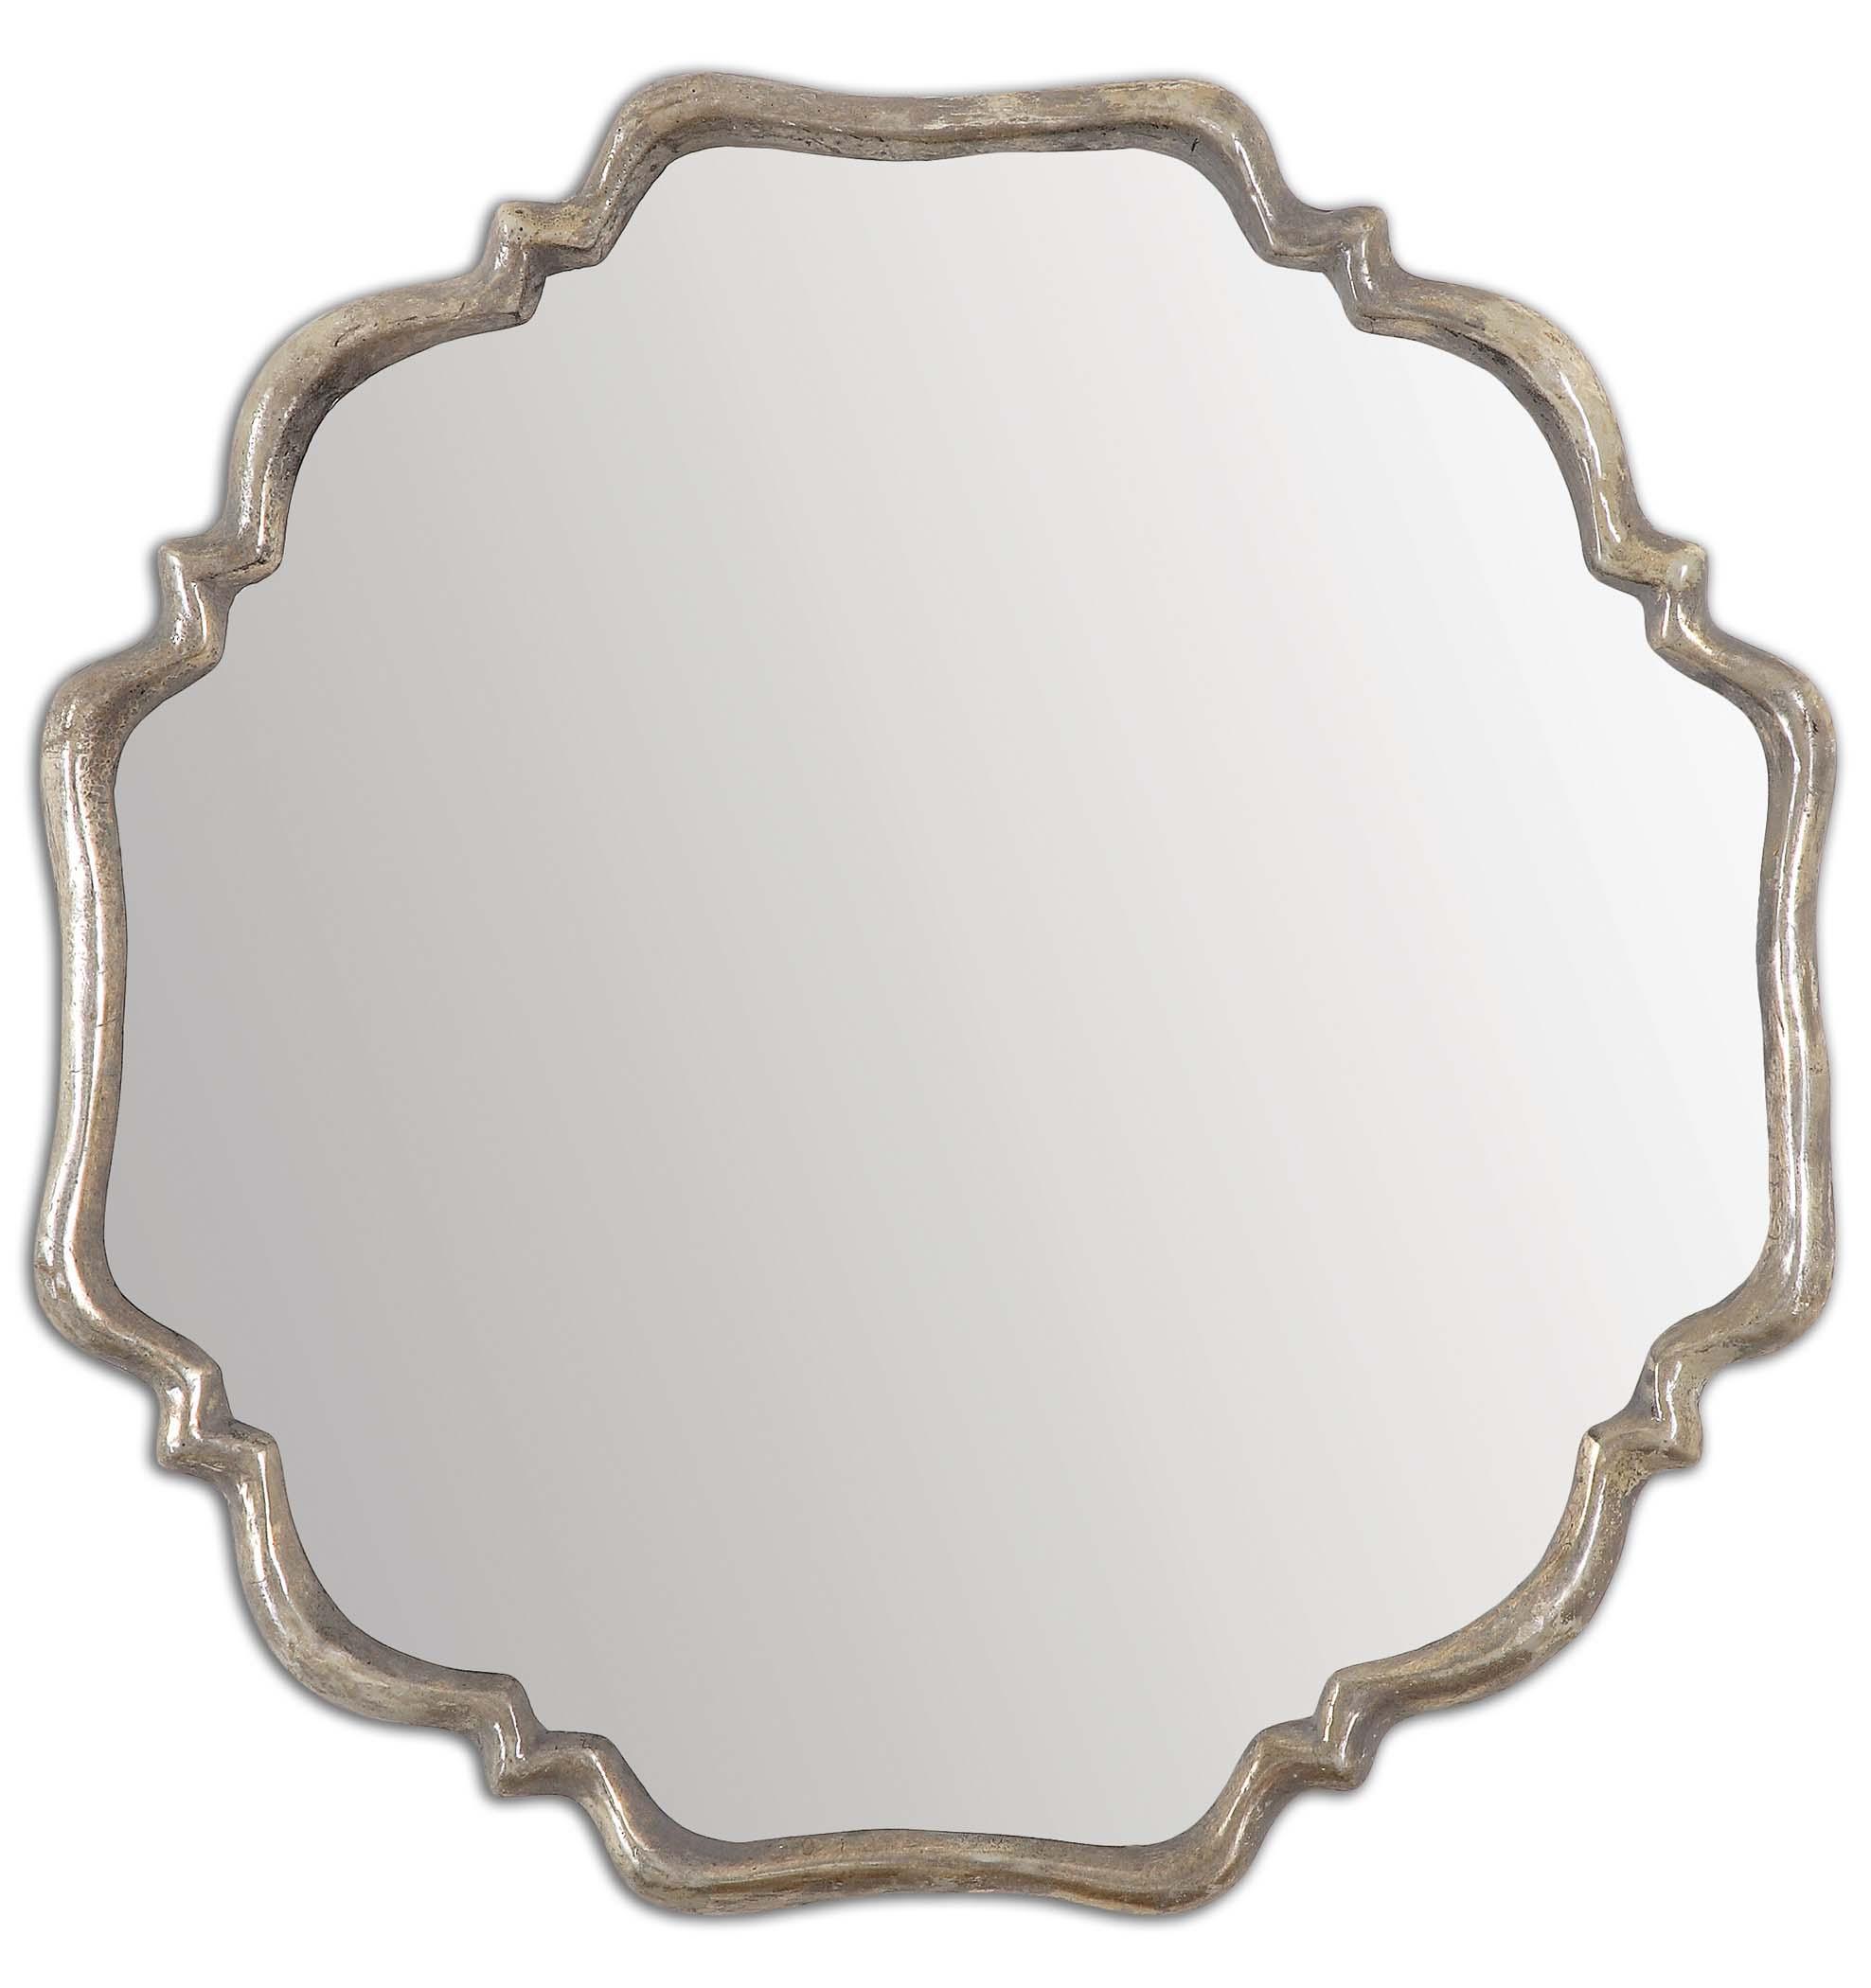 Uttermost Mirrors Valentia Silver Mirror - Item Number: 12849